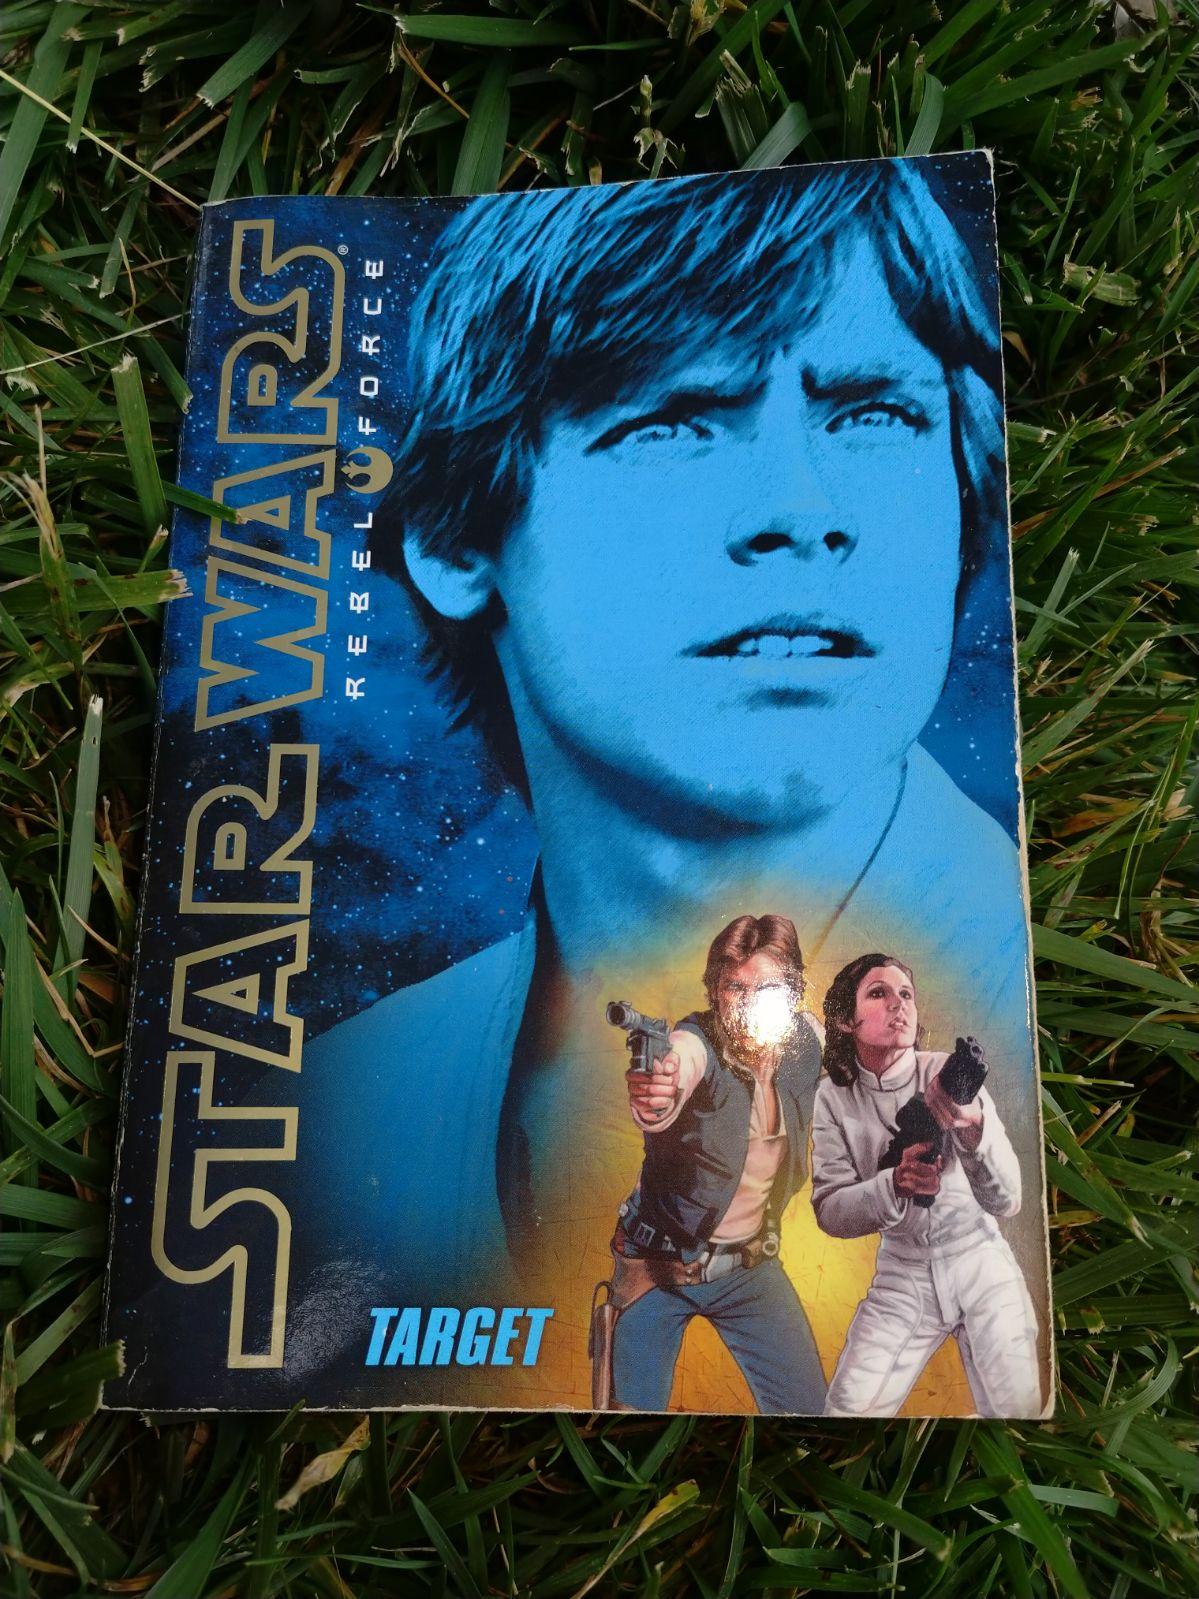 Star Wars Rebel Force book (Target)